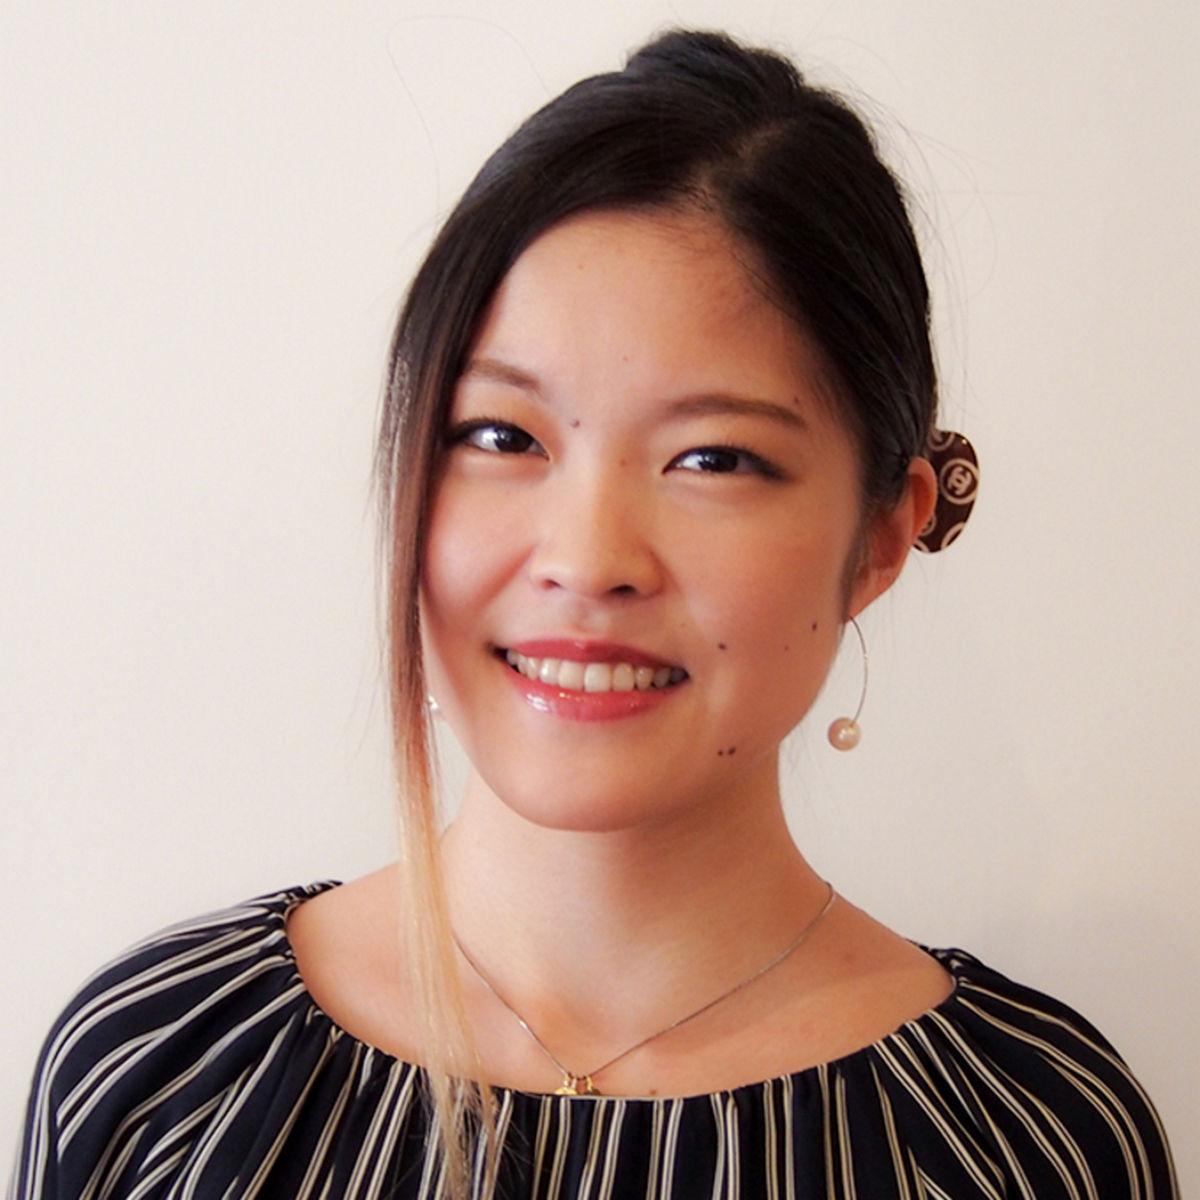 Photo of Kazuko Fukuda from SheDecides Japan